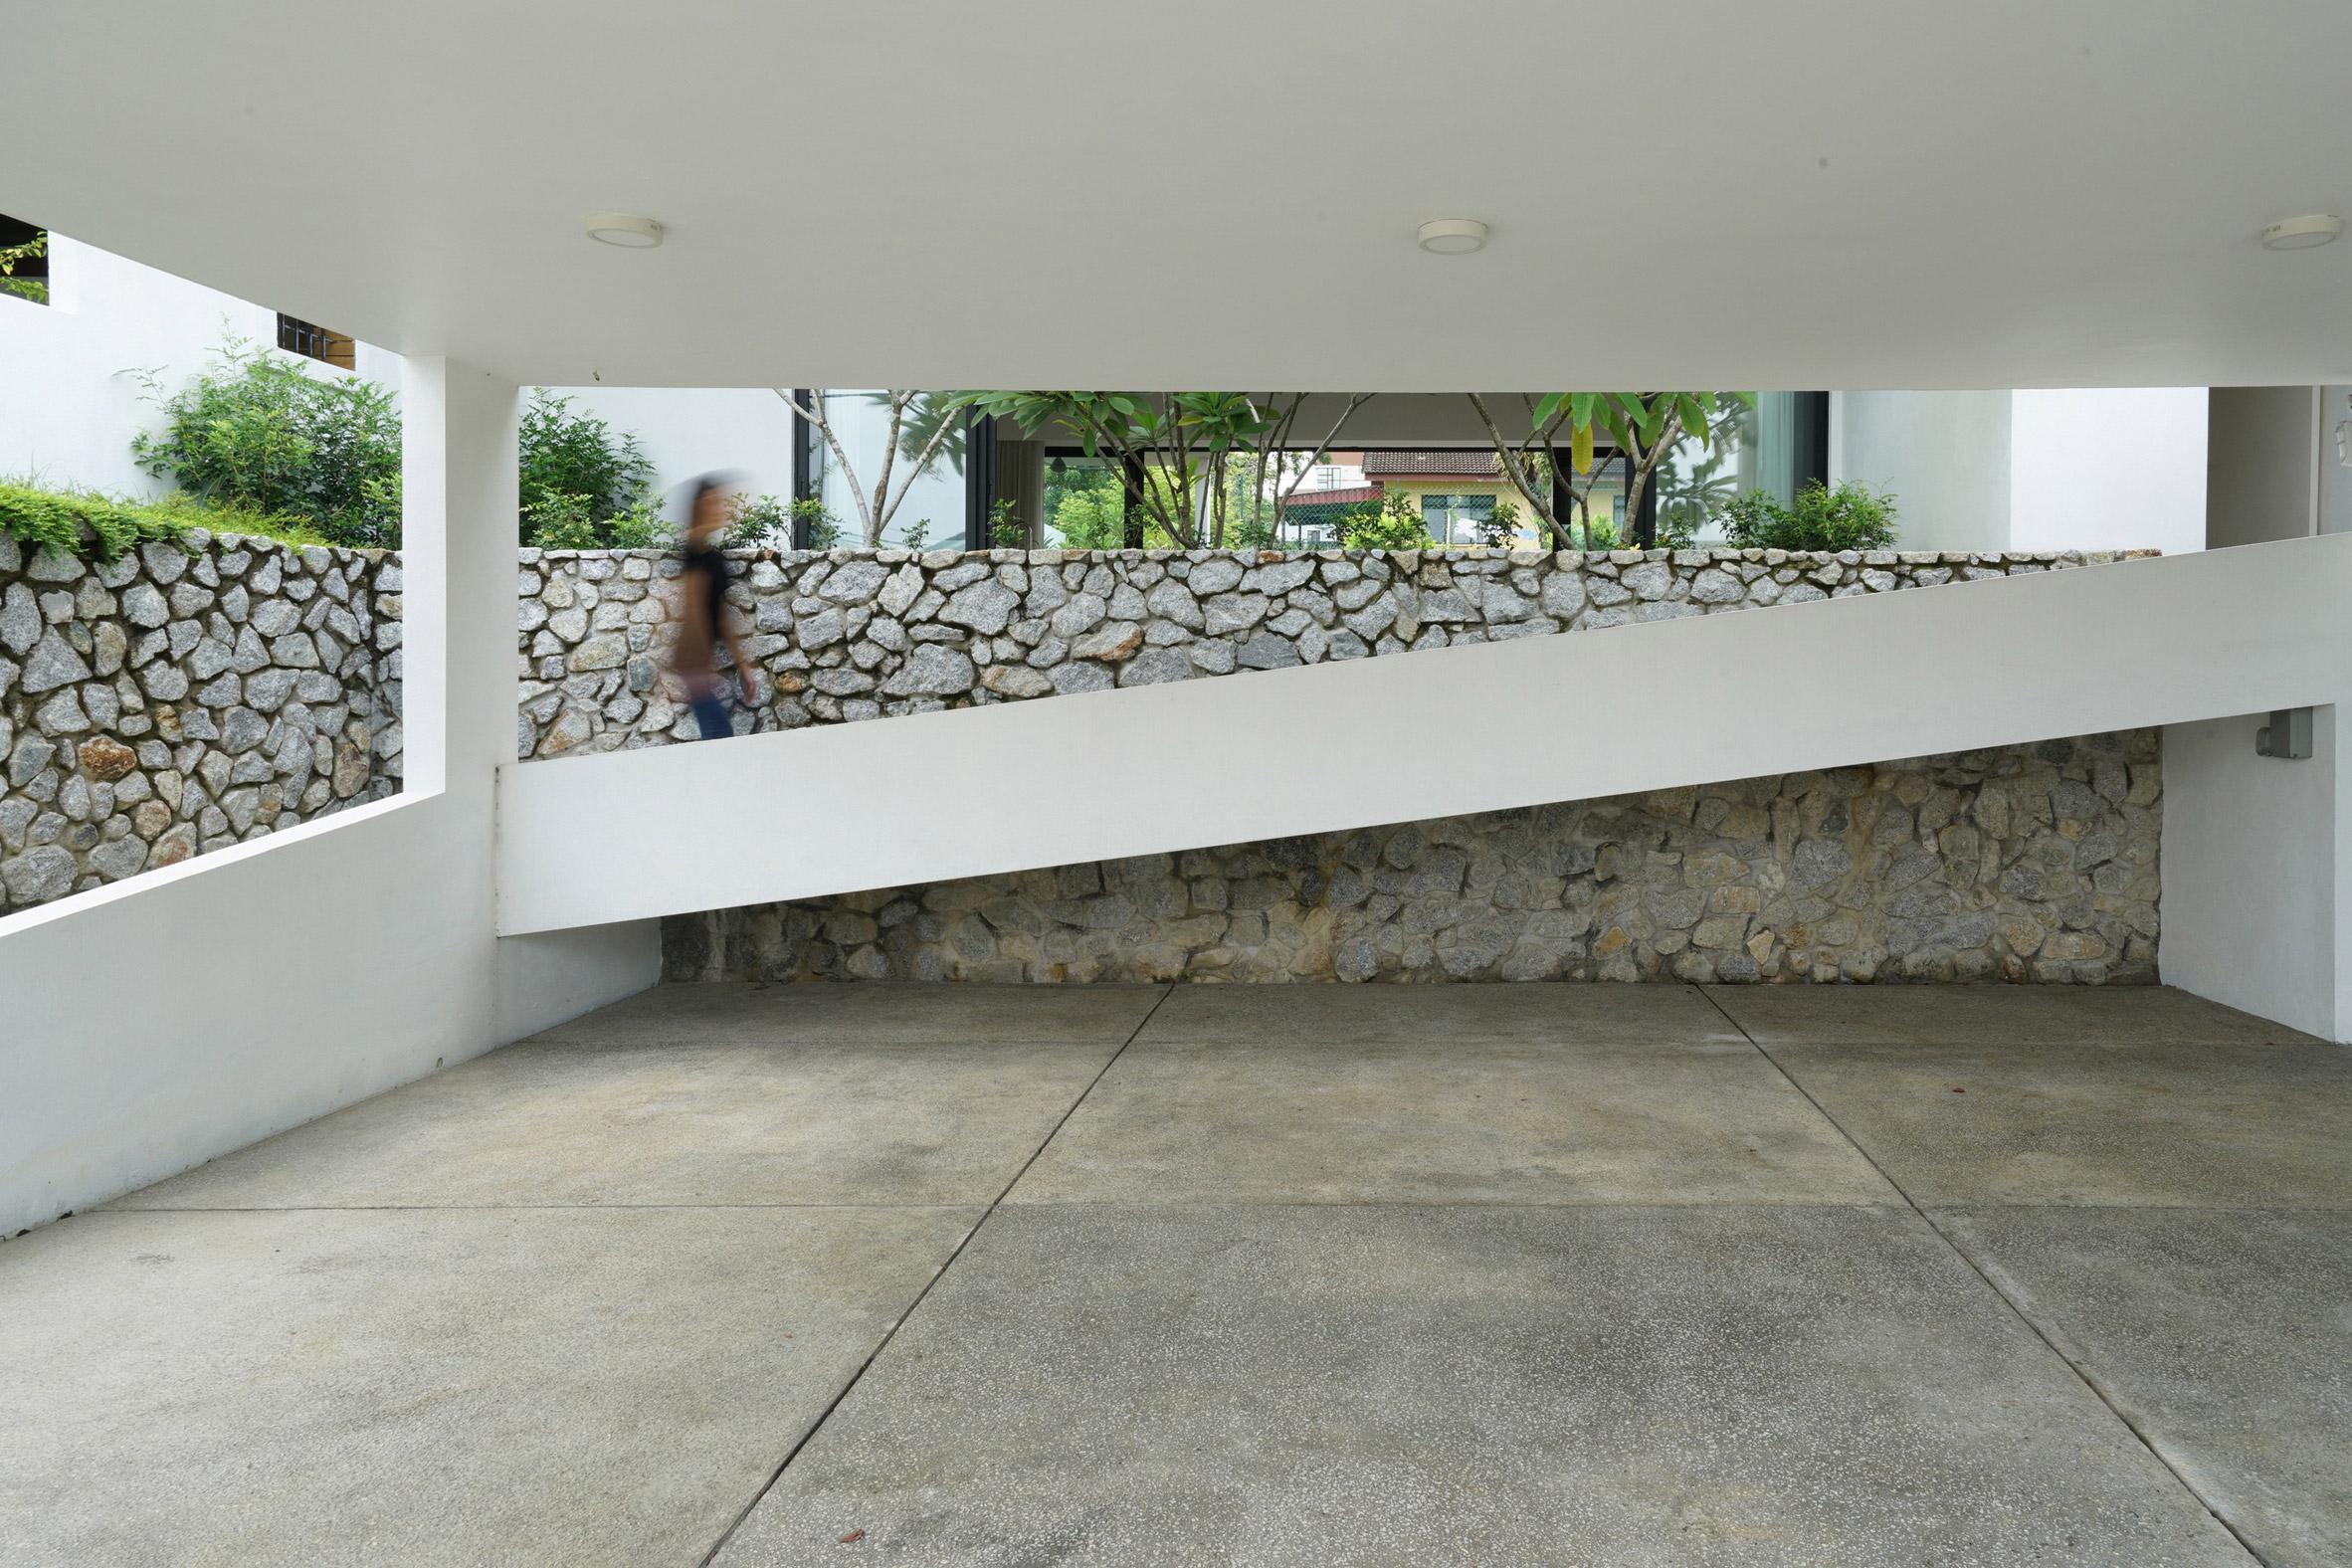 Knikno House by Fabian Tan Architect